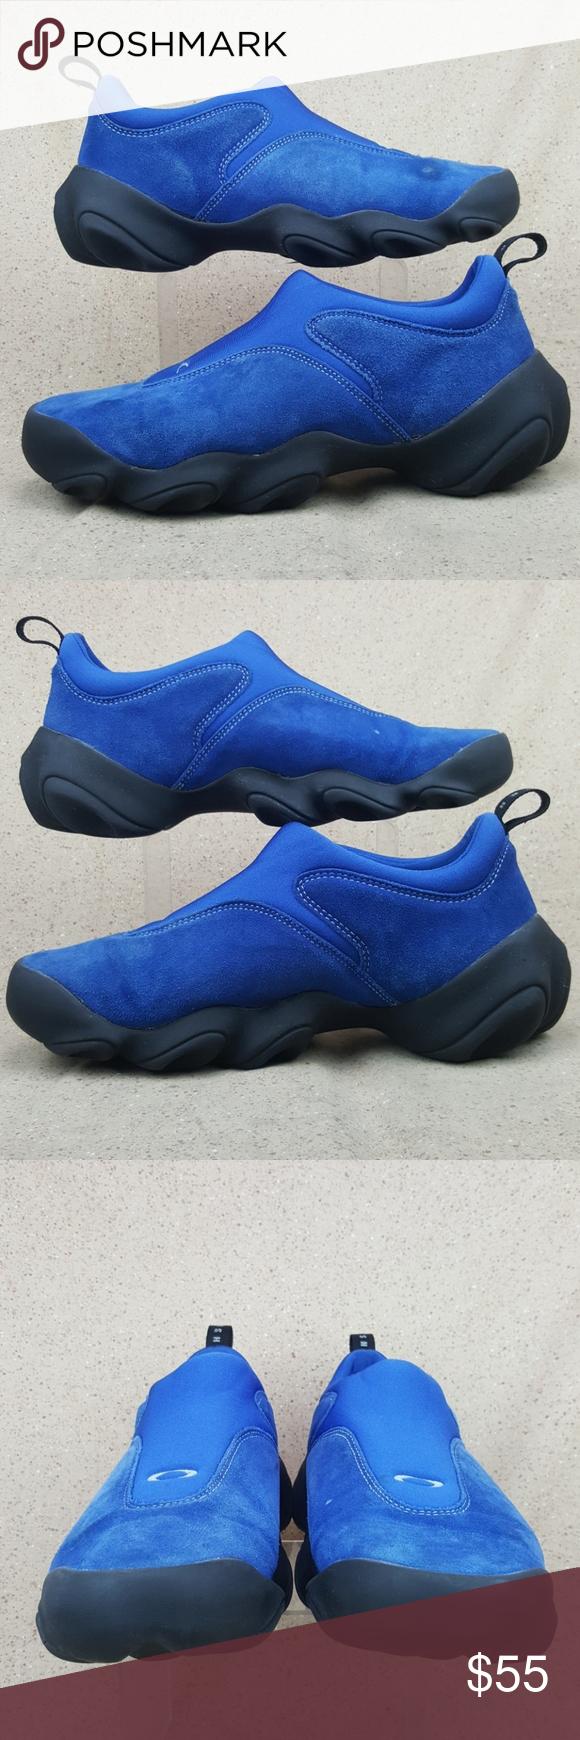 Oakley Flesh Slip On Hiking Shoes M 10